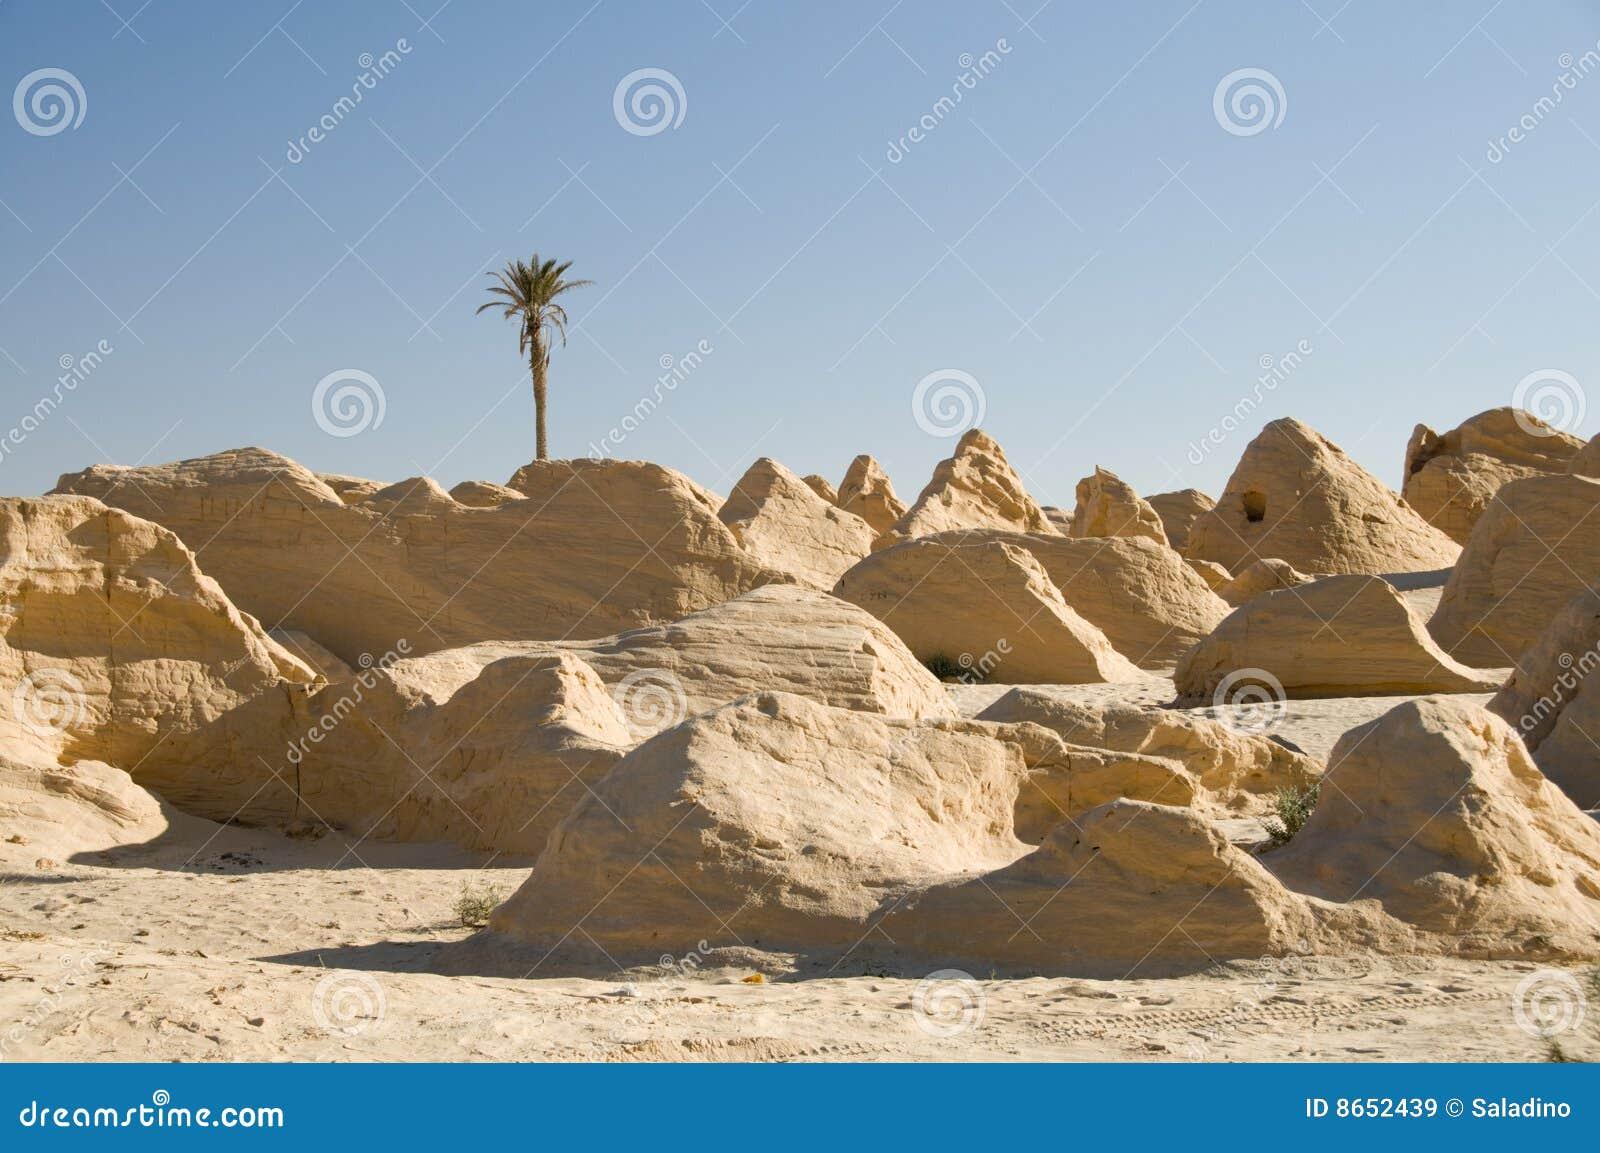 Dunes Petrified